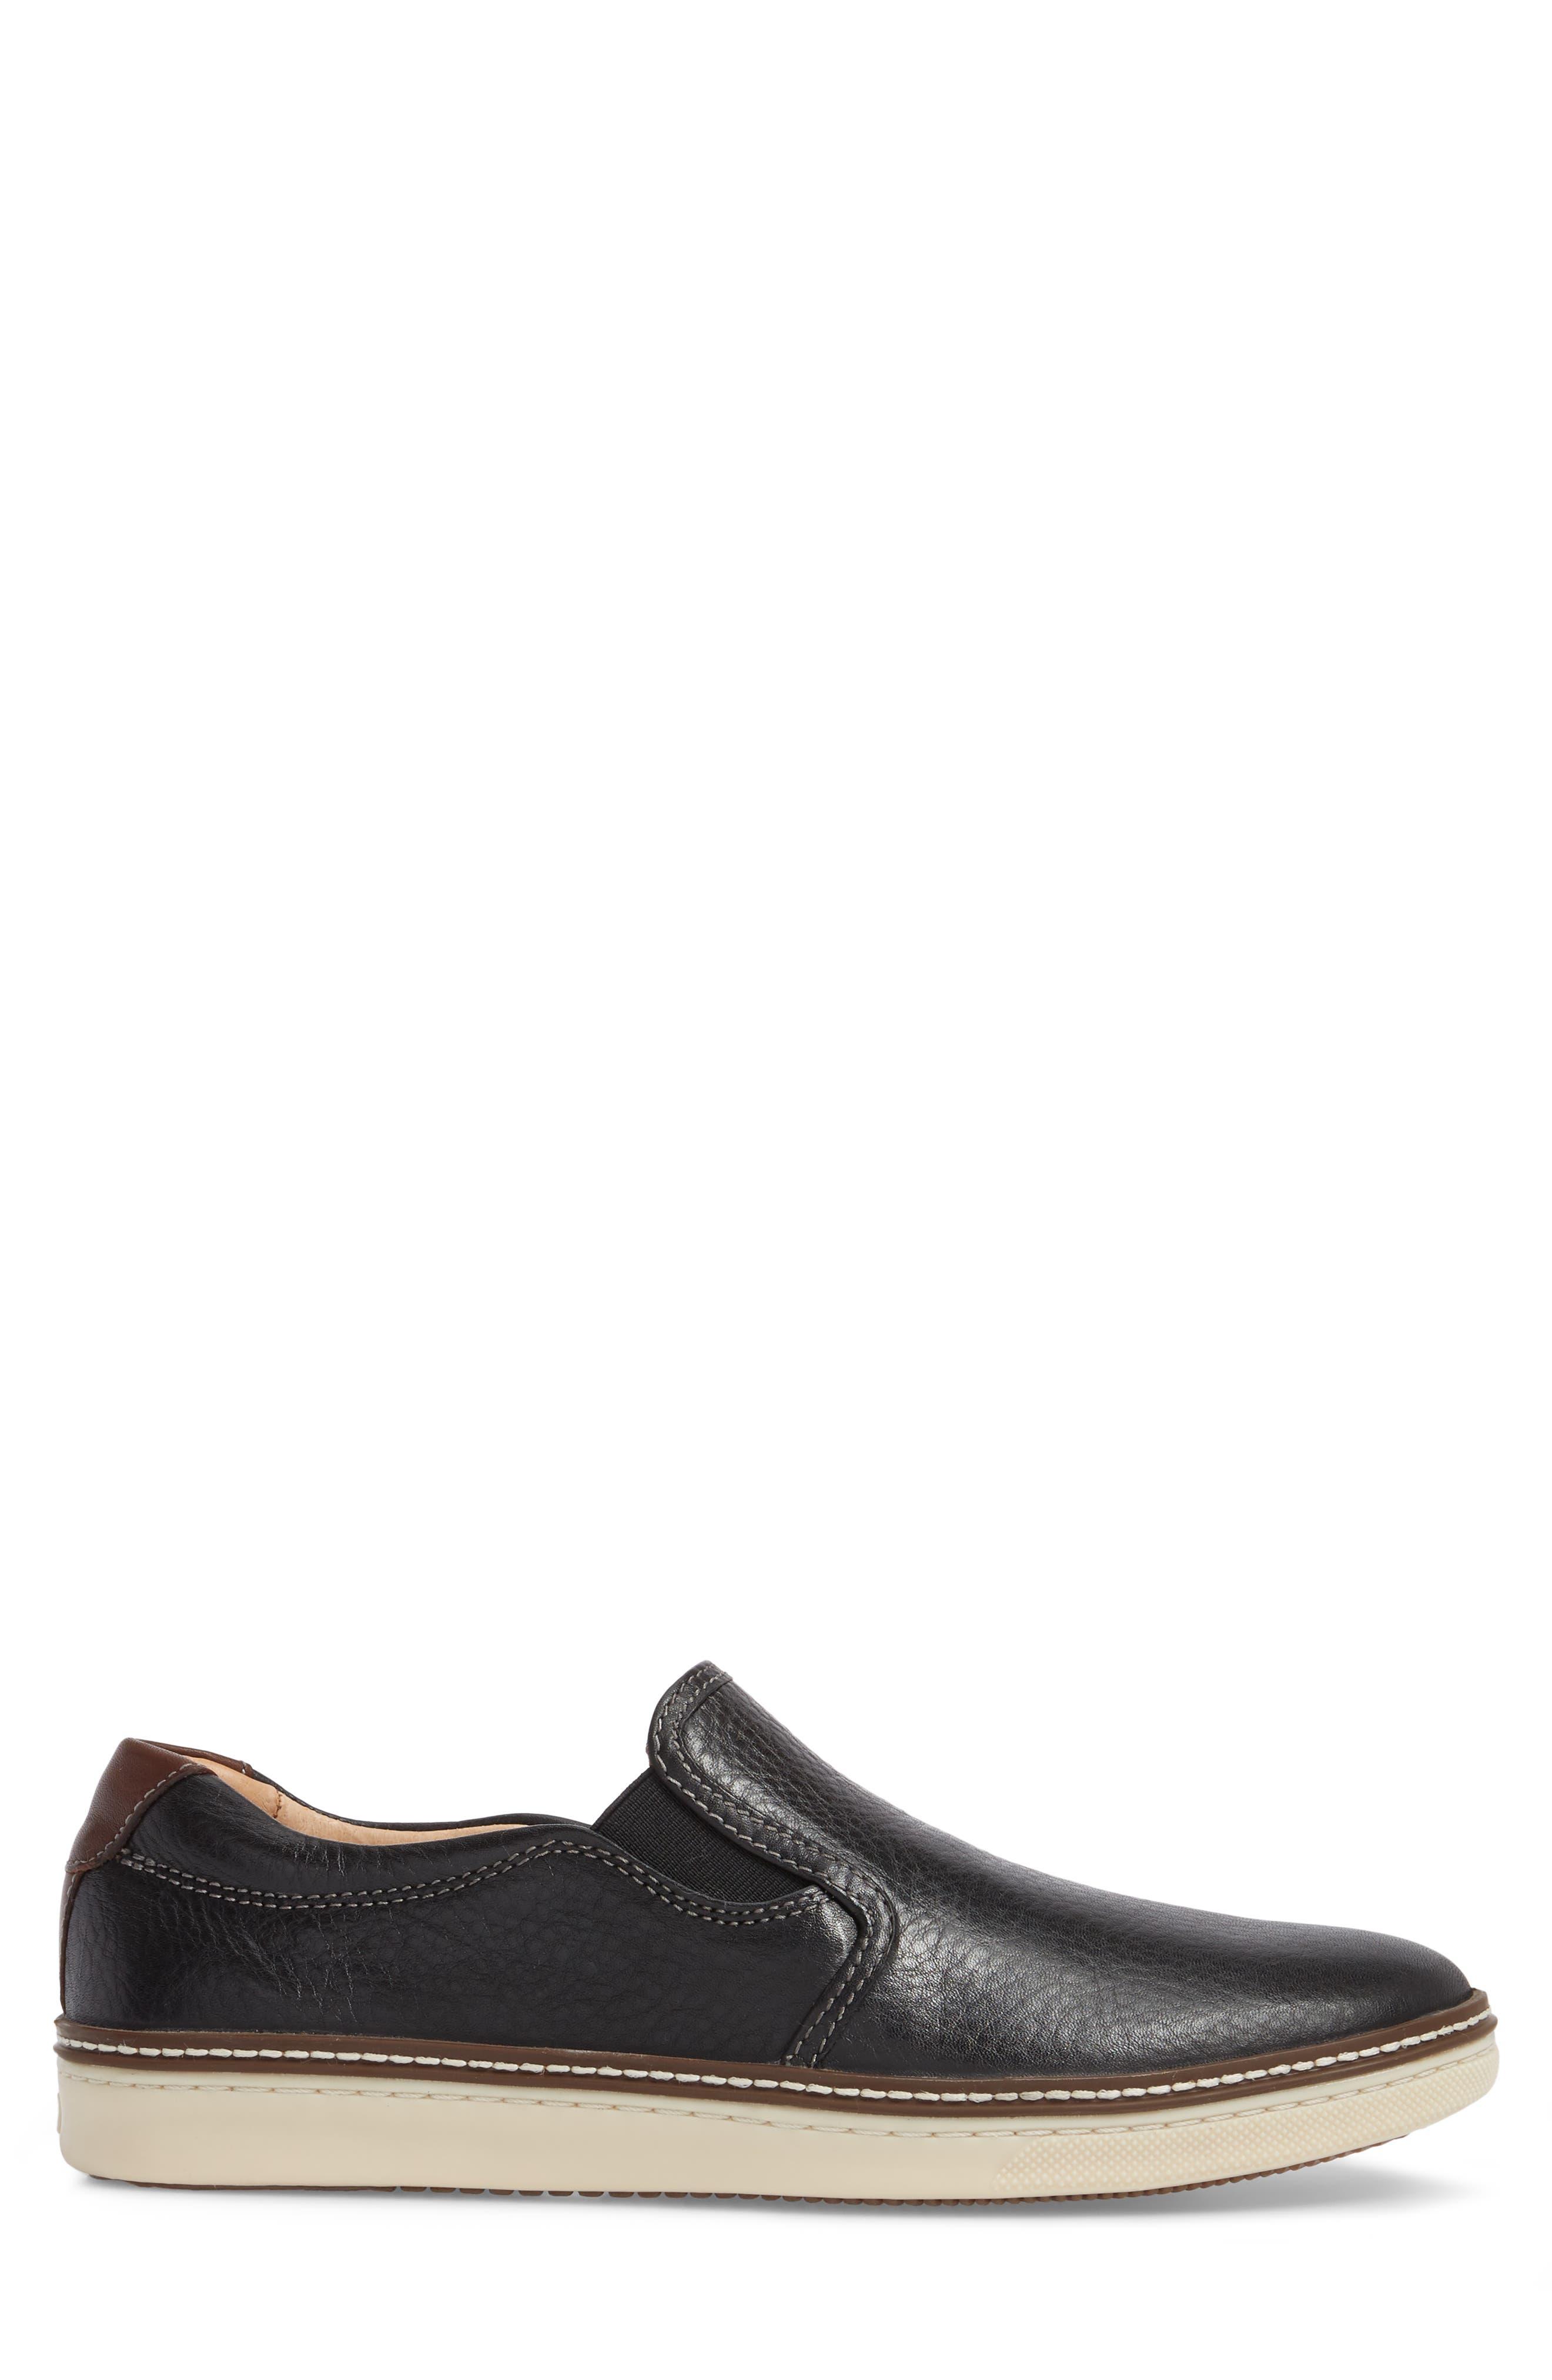 McGuffey Slip-On Sneaker,                             Alternate thumbnail 3, color,                             Black Leather